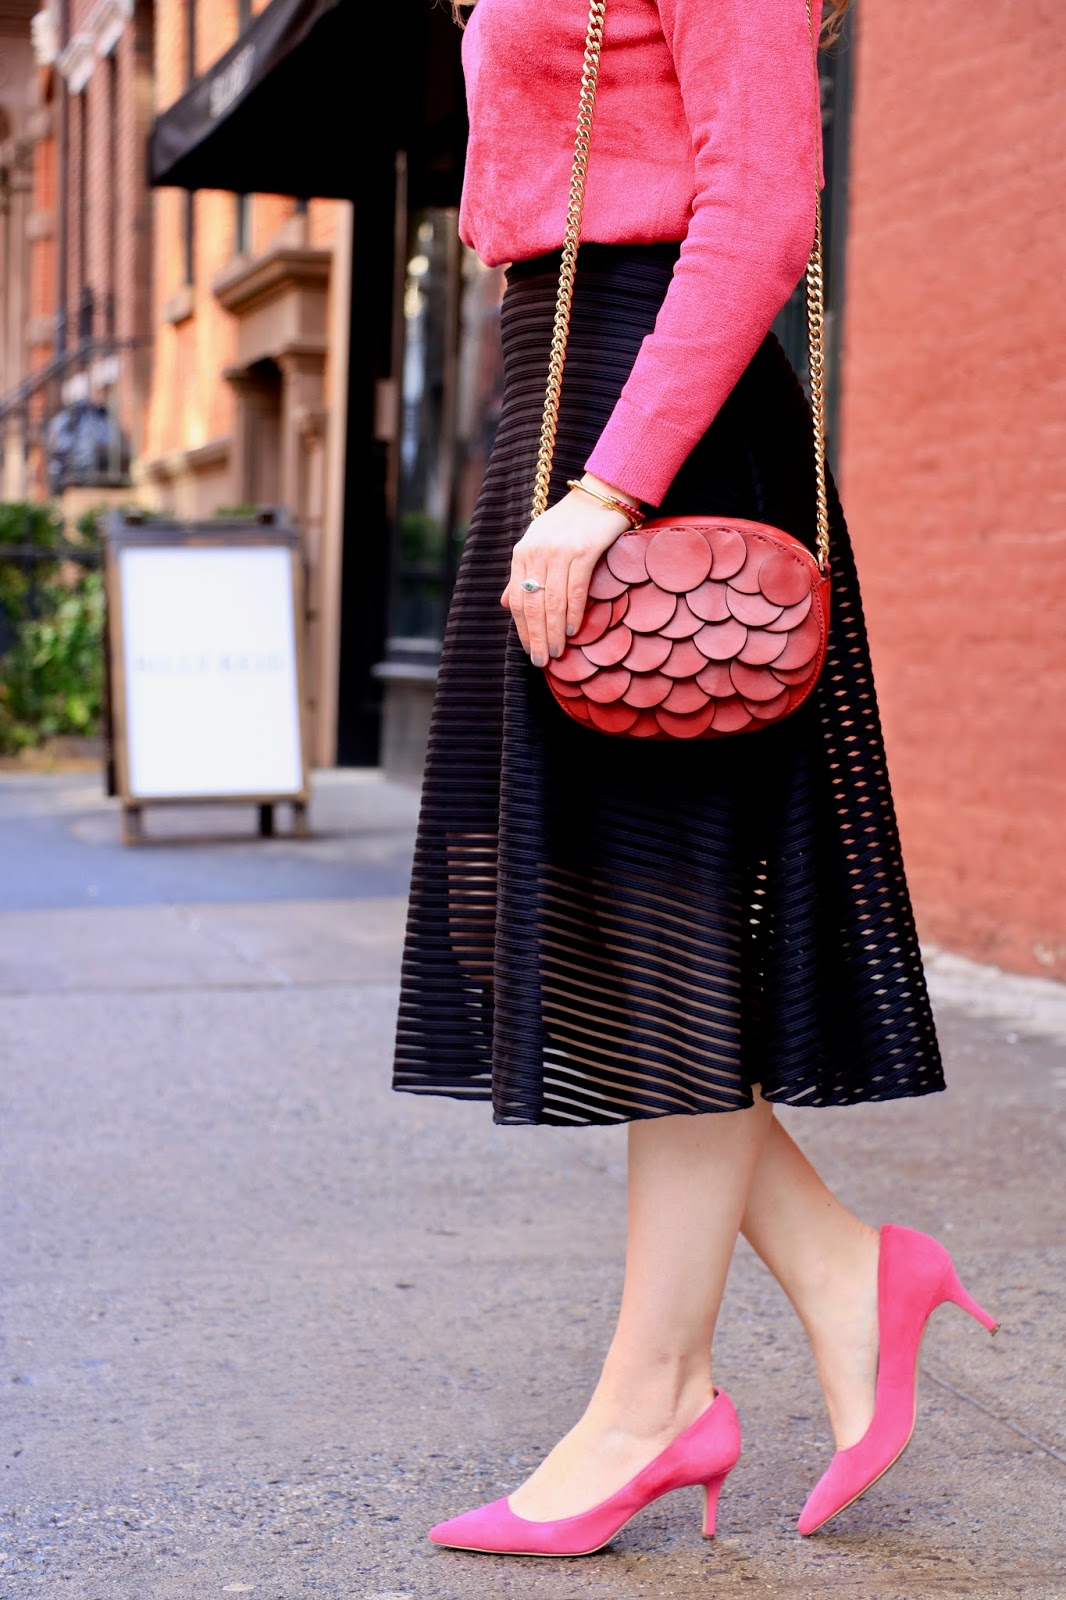 Nyc fashion blogger Kathleen Harper wearing a black midi skirt and pink heels